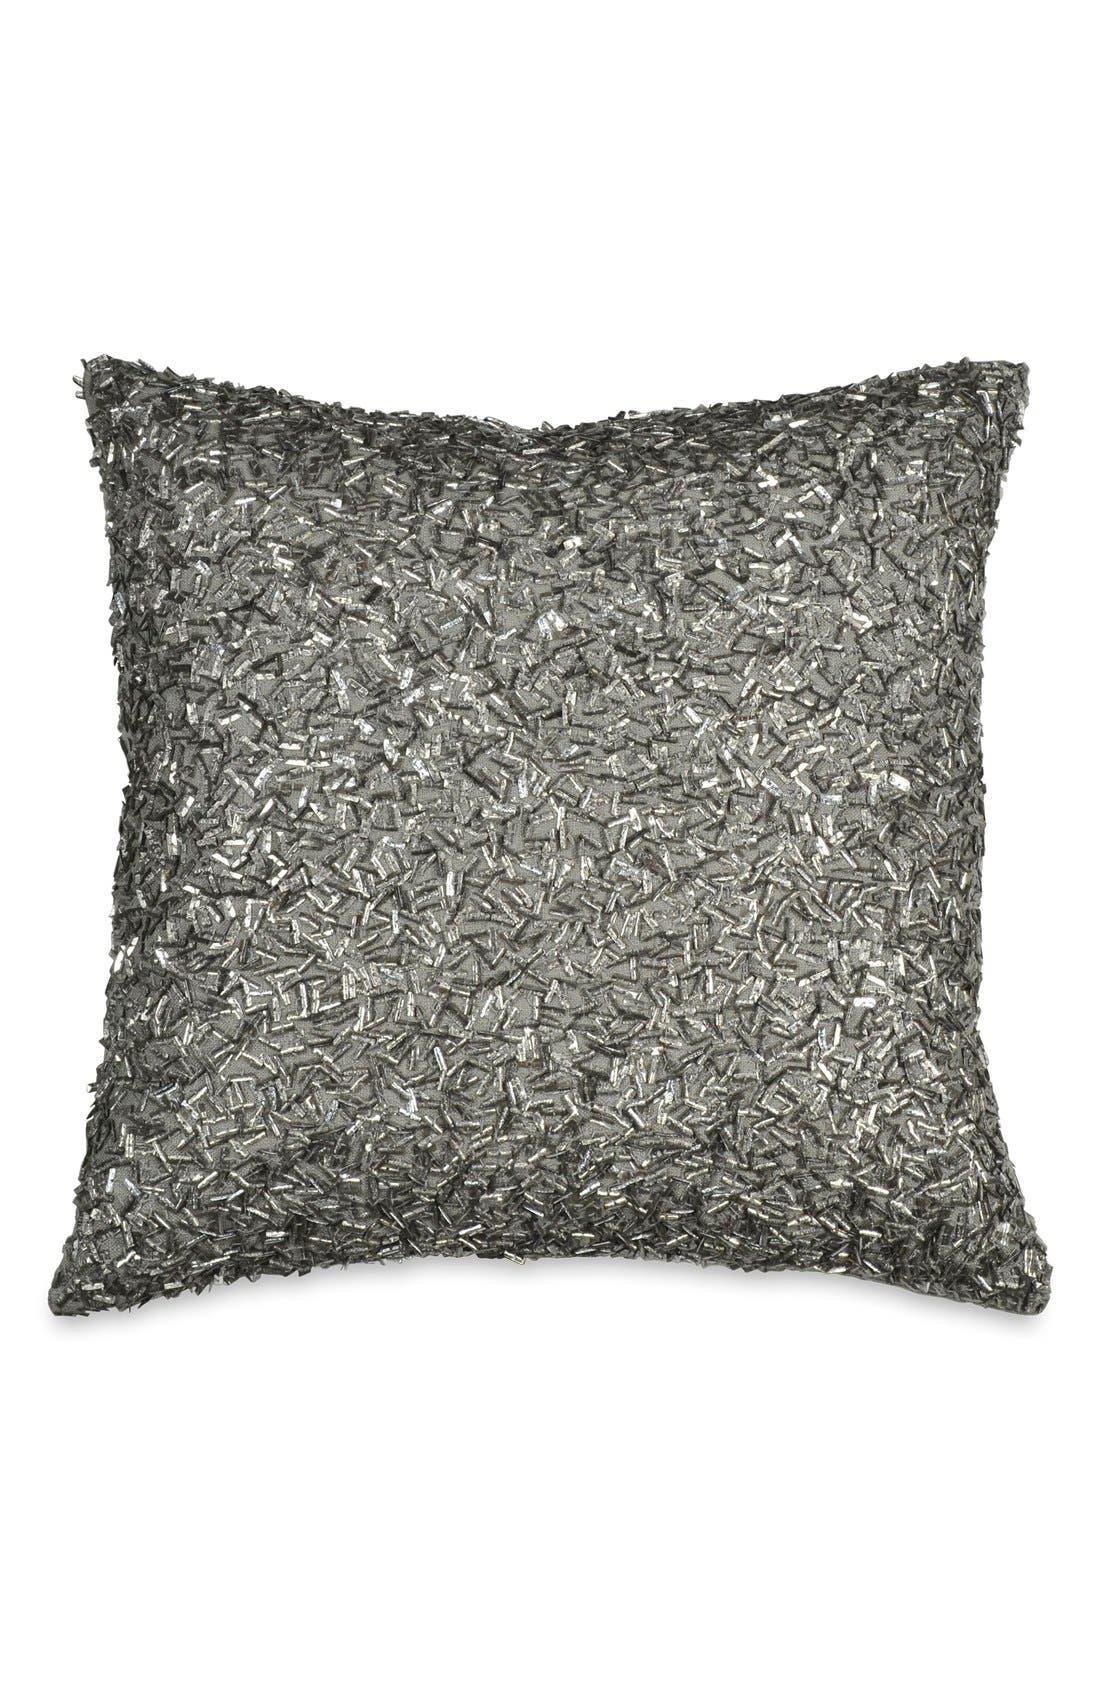 Donna Karan Collection 'Exhale' Pillow,                         Main,                         color, 060